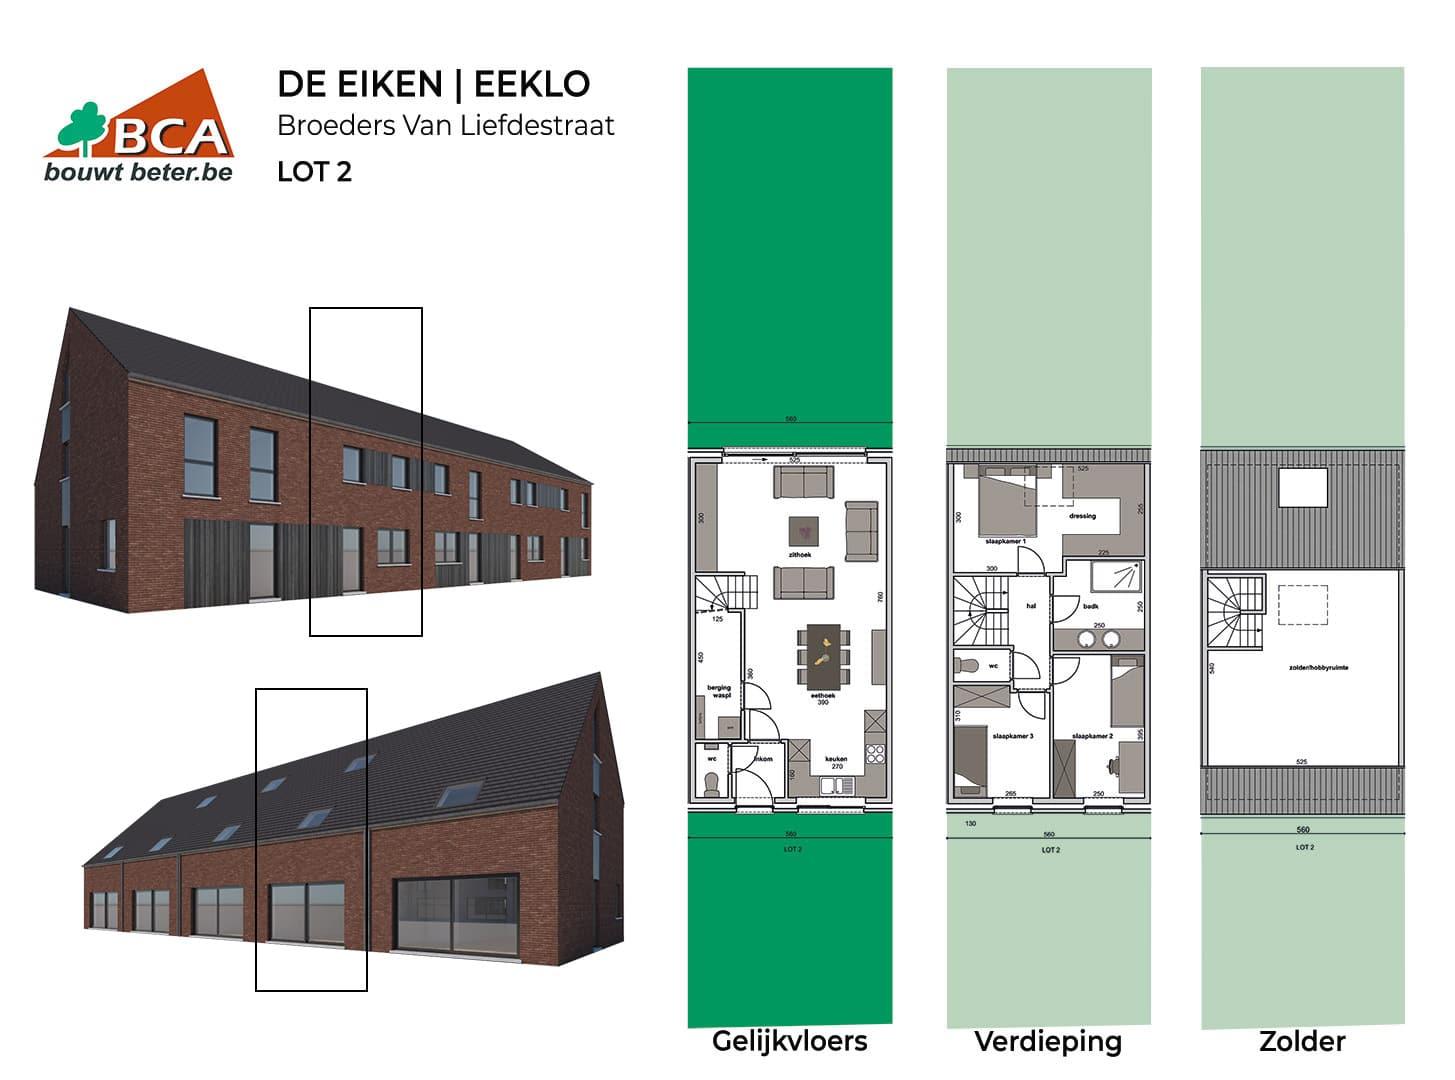 Eeklo-de-eiken-plannen-lot-2